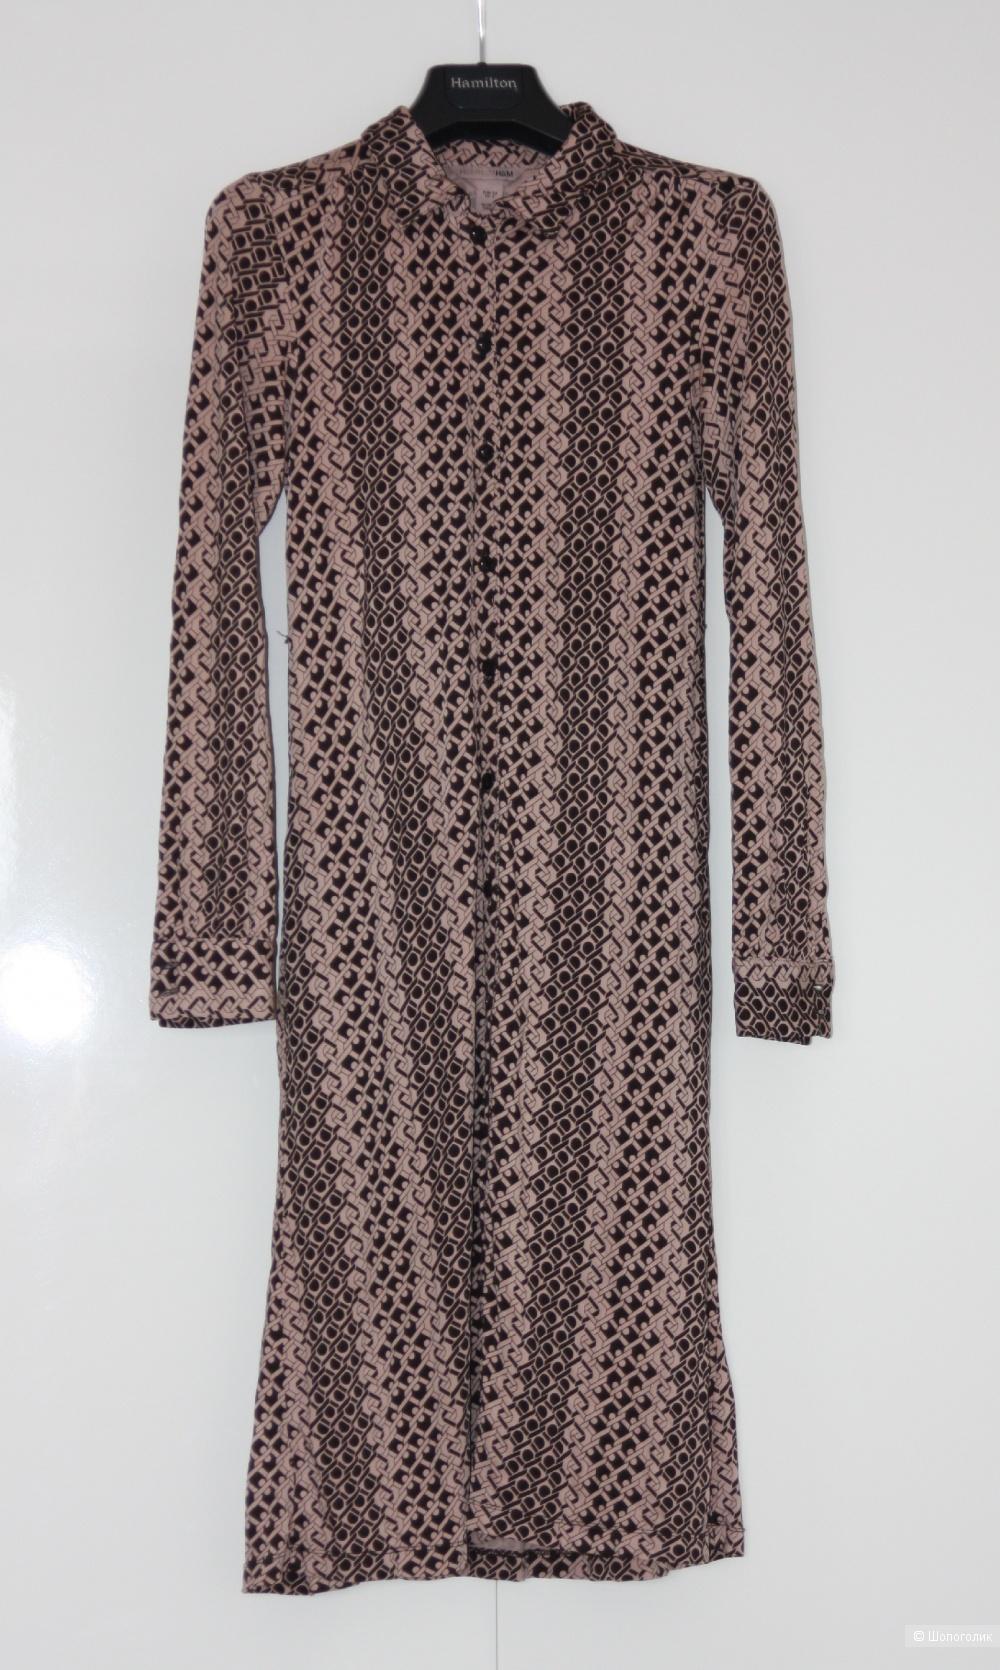 Платье H&M, 42-44 (34 eur)